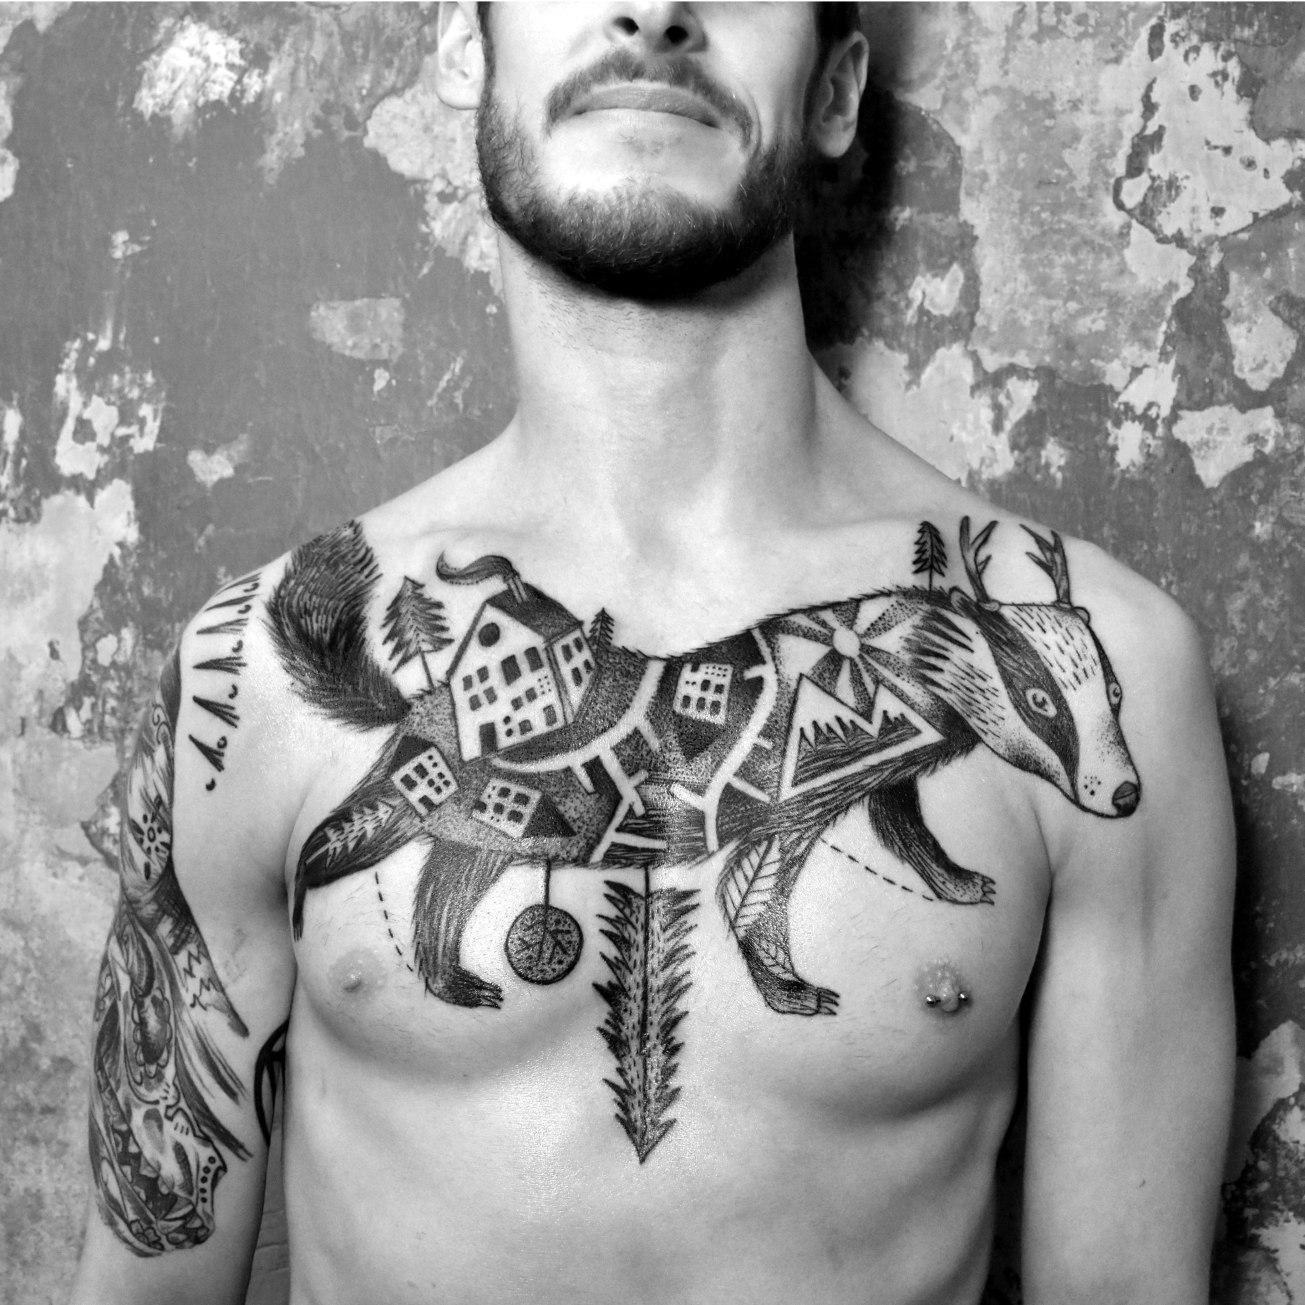 miriam_frank_tattoo_dachs_4